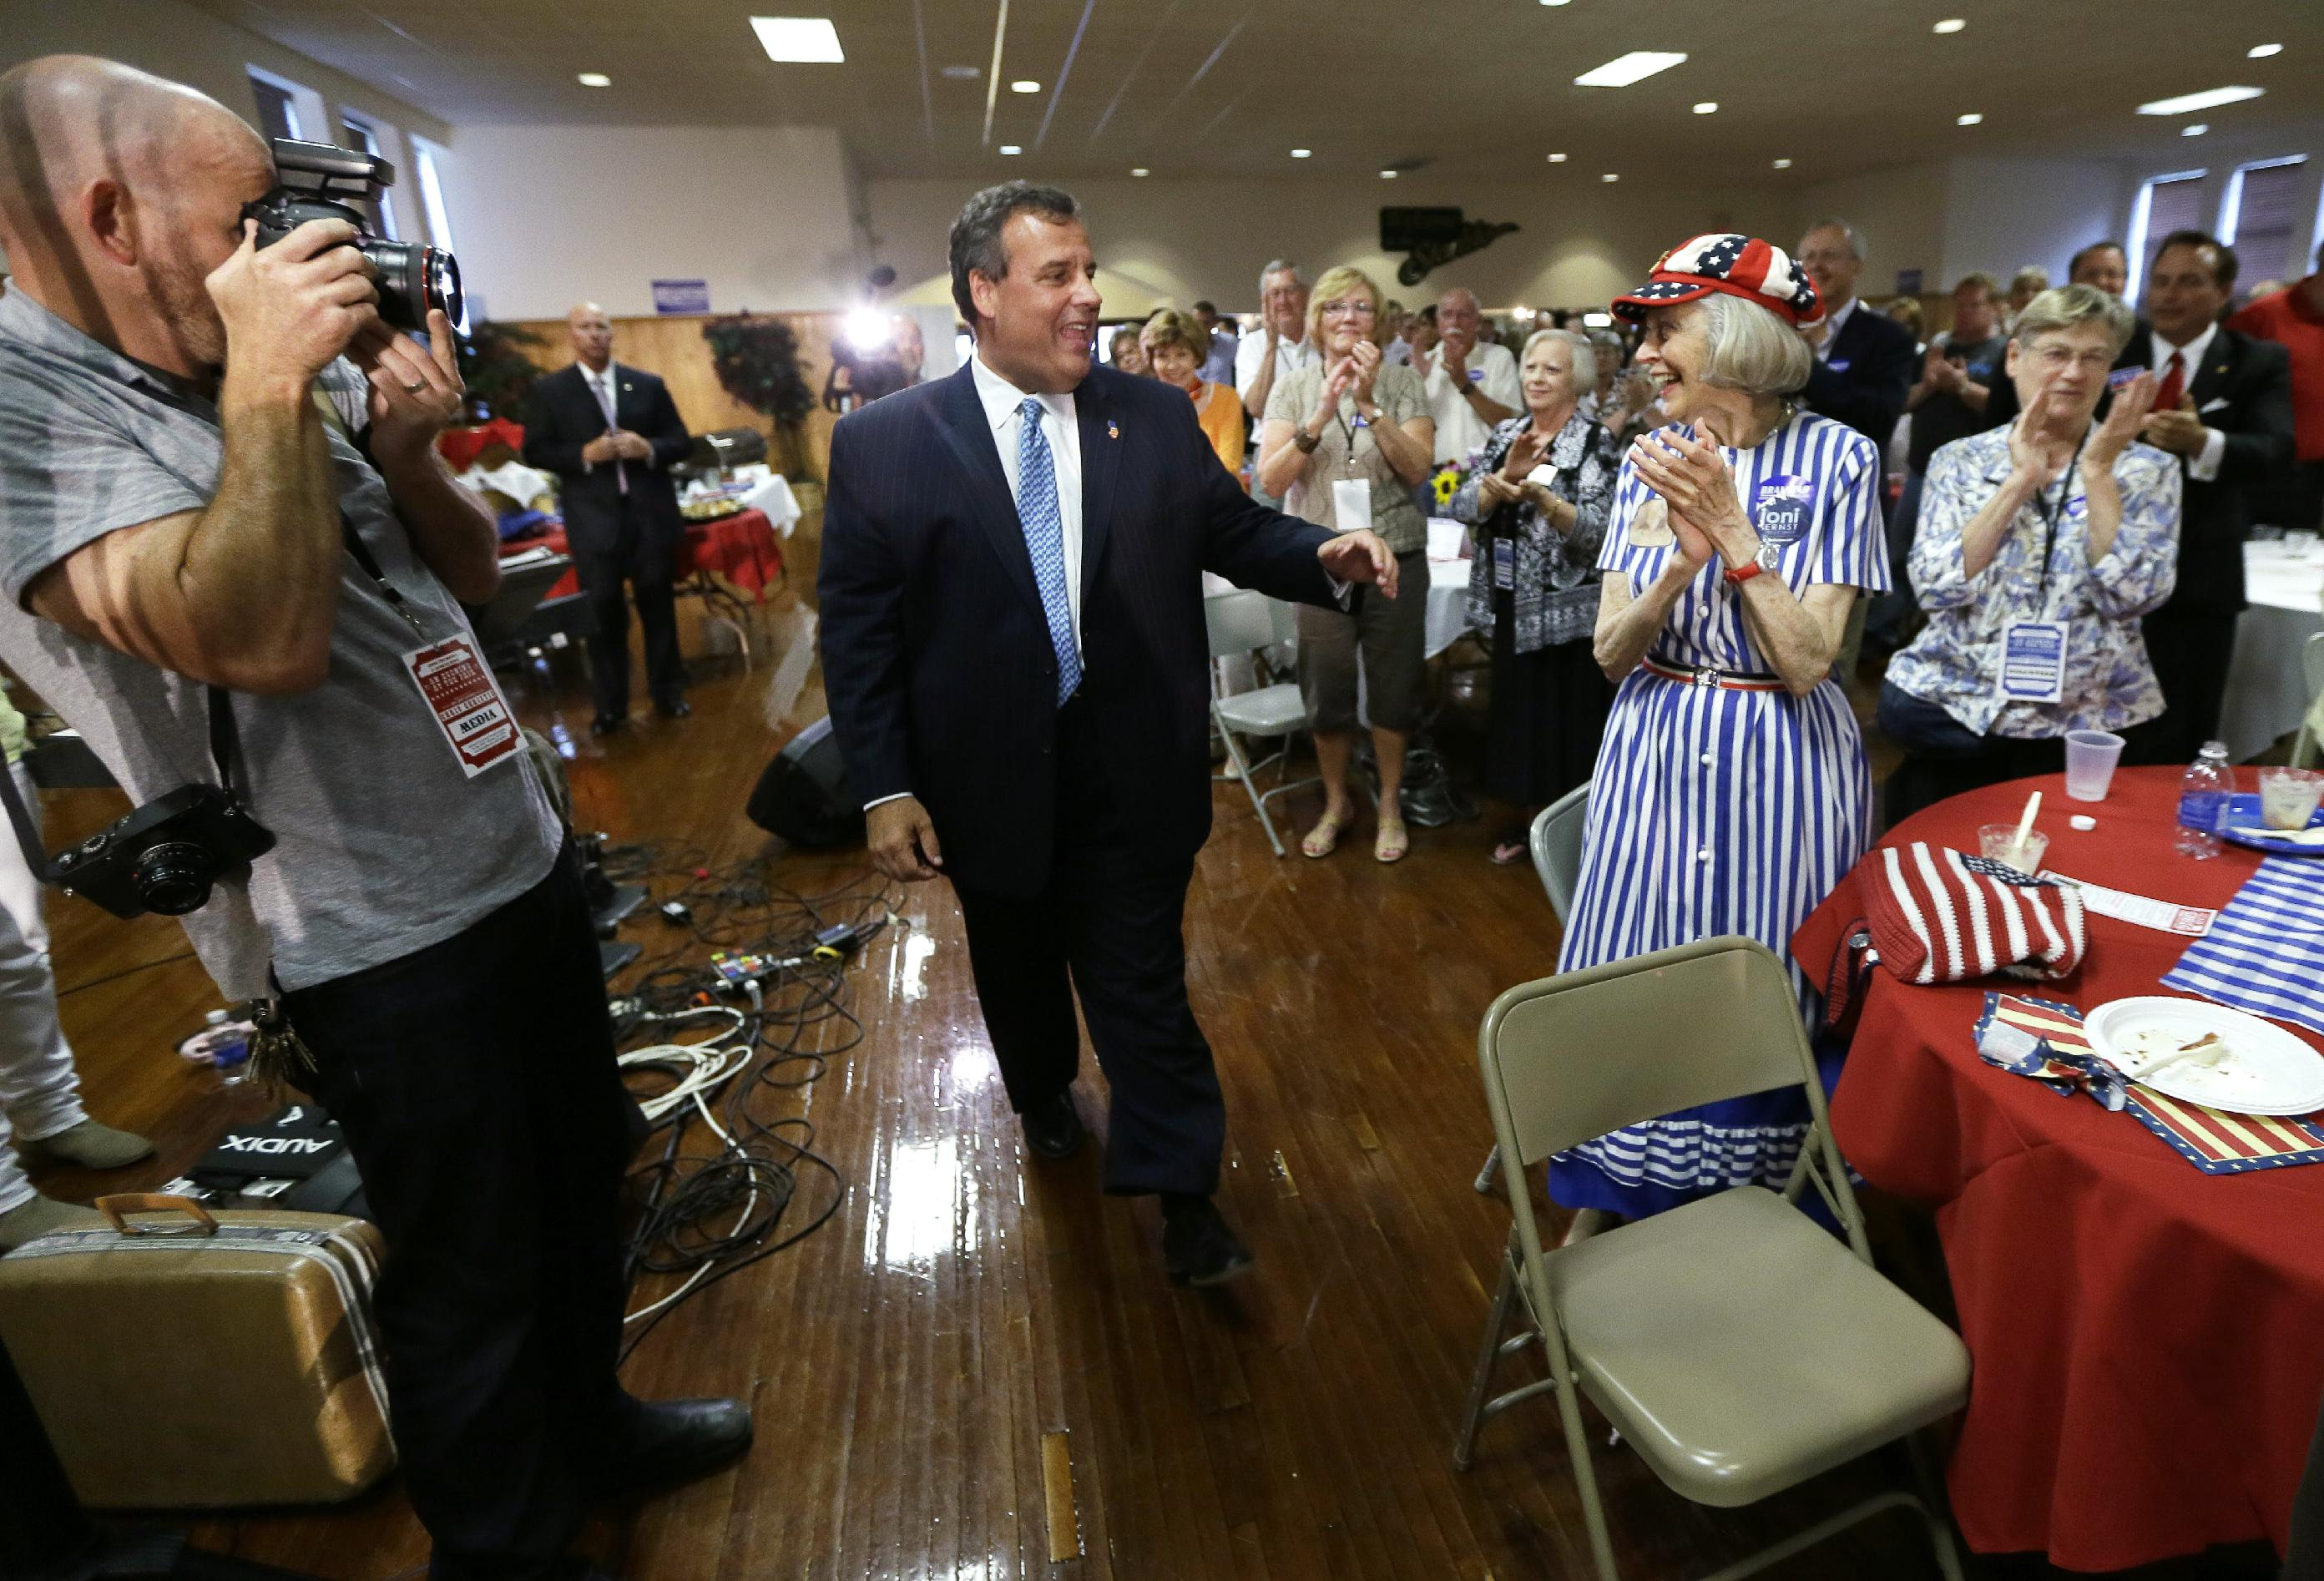 Is Gov. Chris Christie's brash style presidential or bullying?